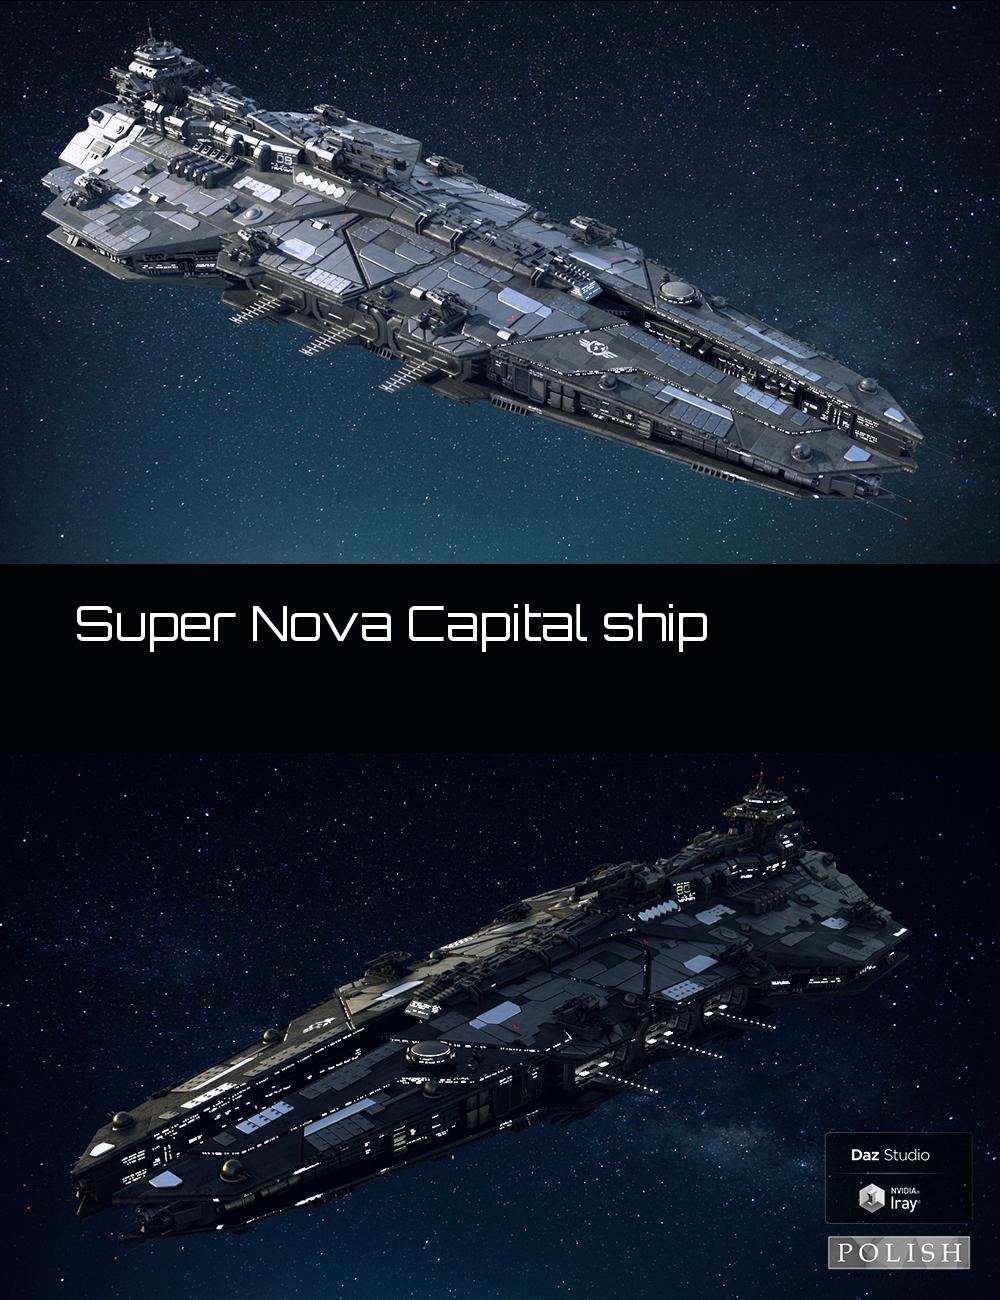 Super Nova Capital Ship by: Polish, 3D Models by Daz 3D